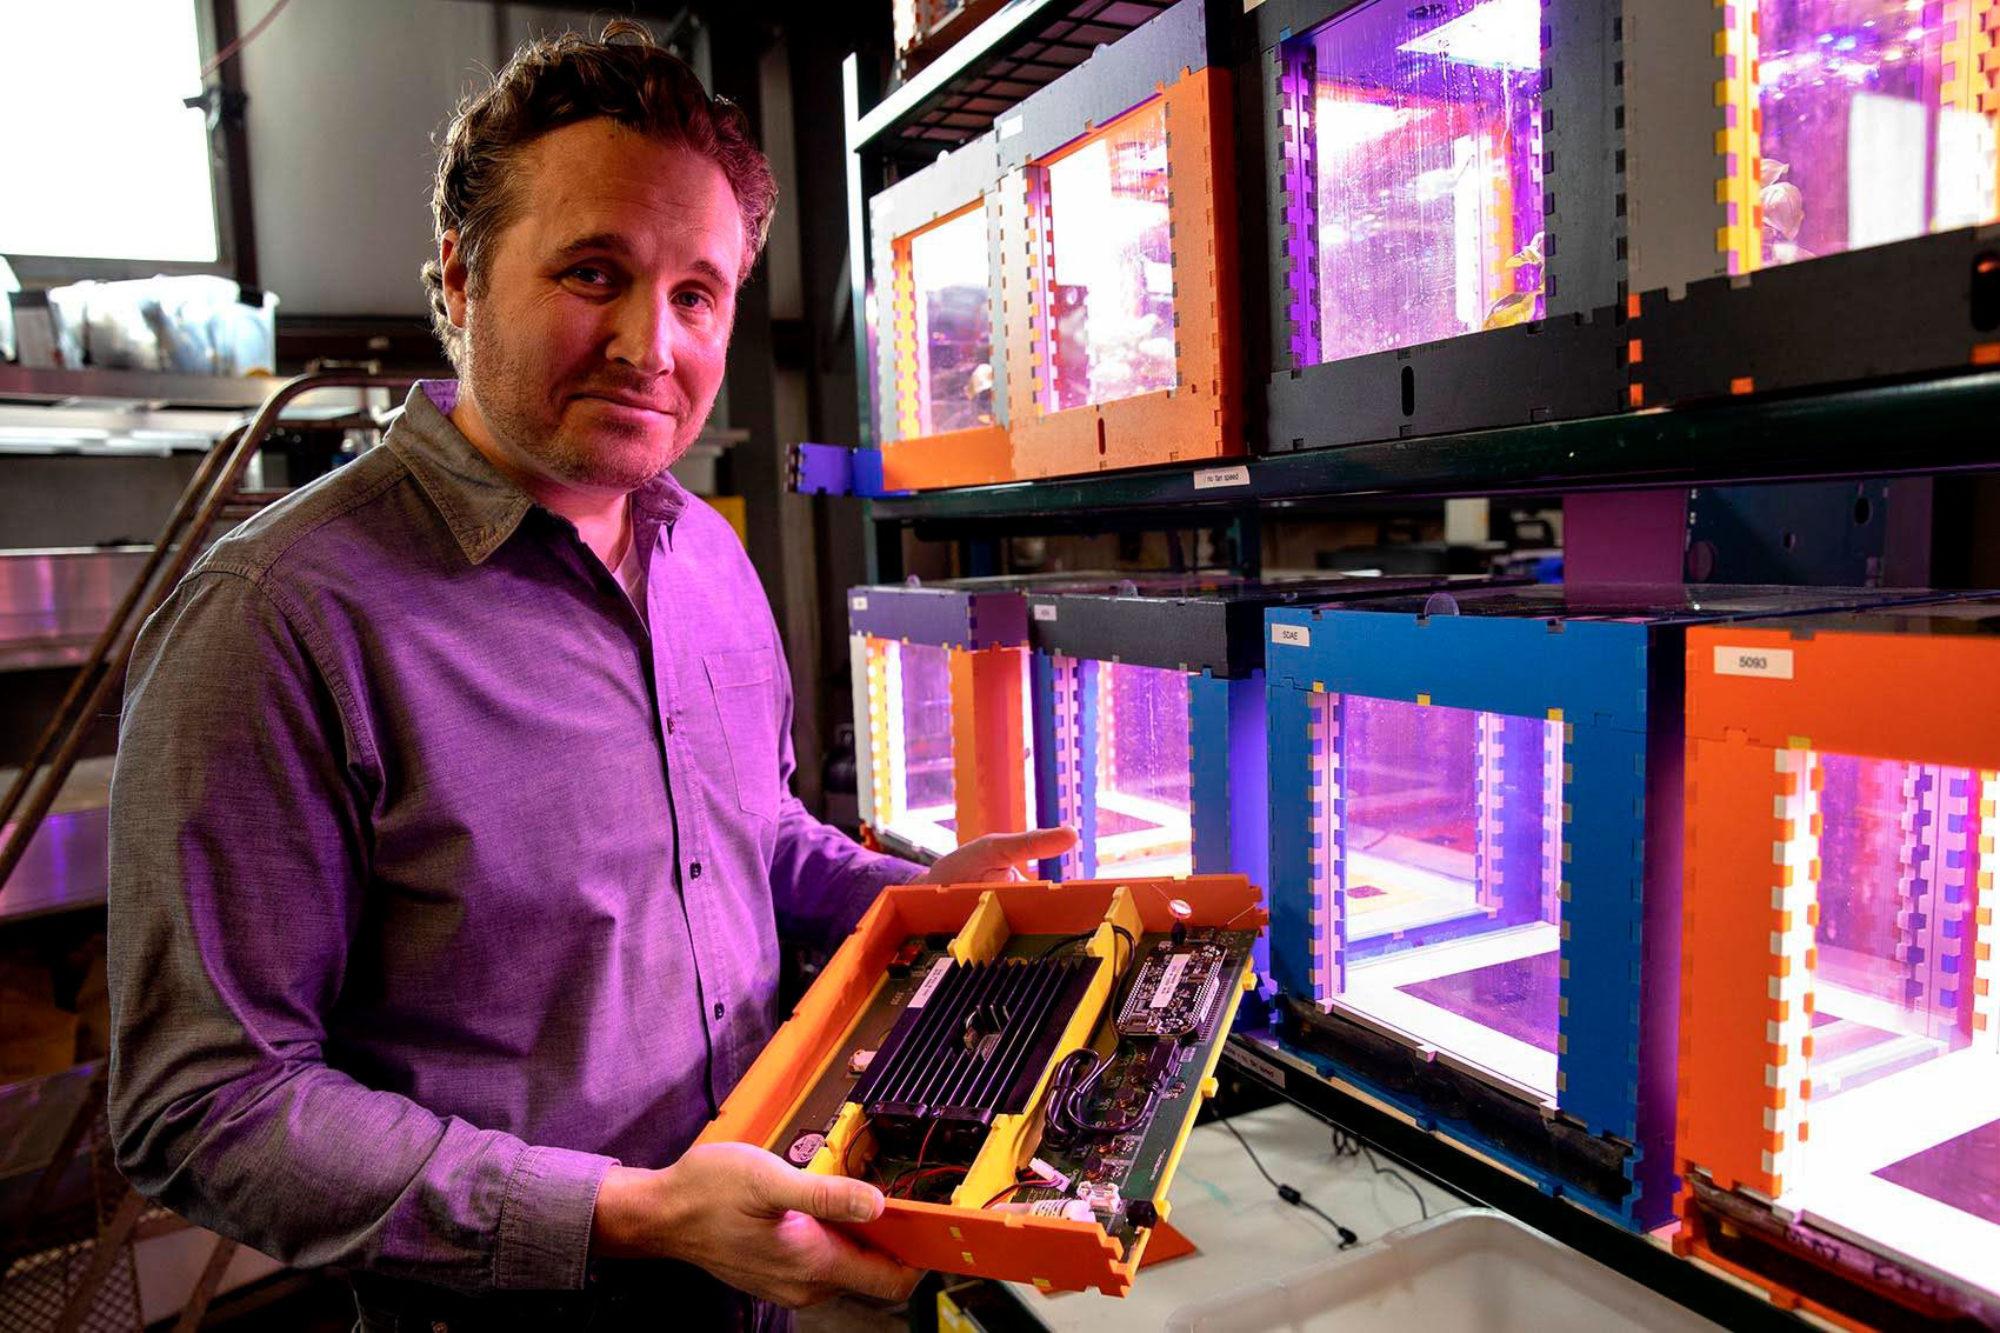 MIT Media Lab Kept Regulators in the Dark, Dumped Chemicals in Excess of Legal Limit